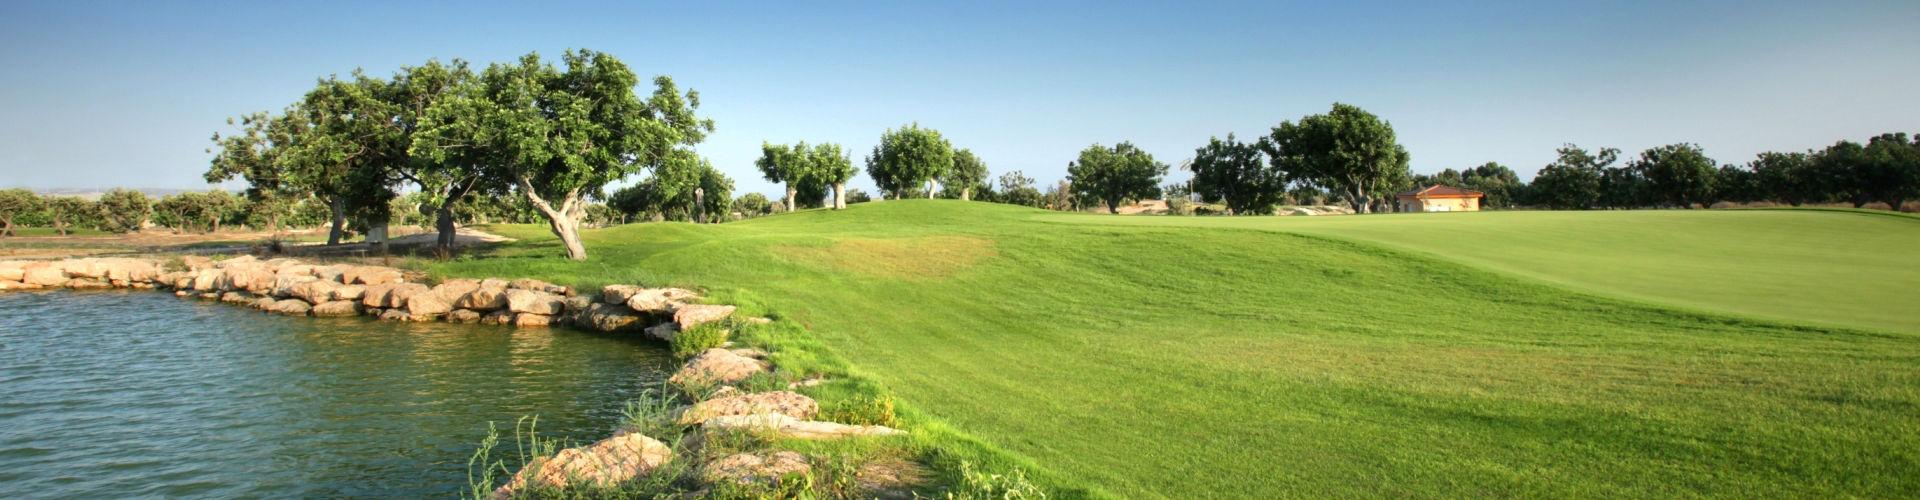 Golfresor Cypern - golfreseguiden.se